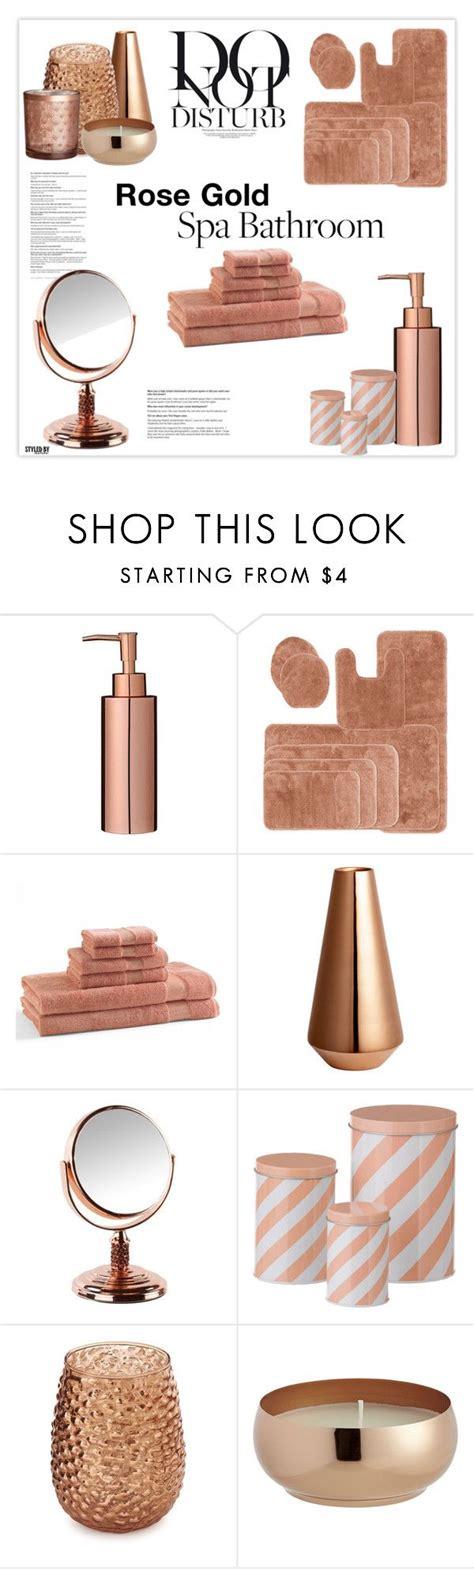 1000 ideas about copper accents on pinterest copper kitchen copper kitchen decor and copper pink copper rose gold decor painted mason jars home decor